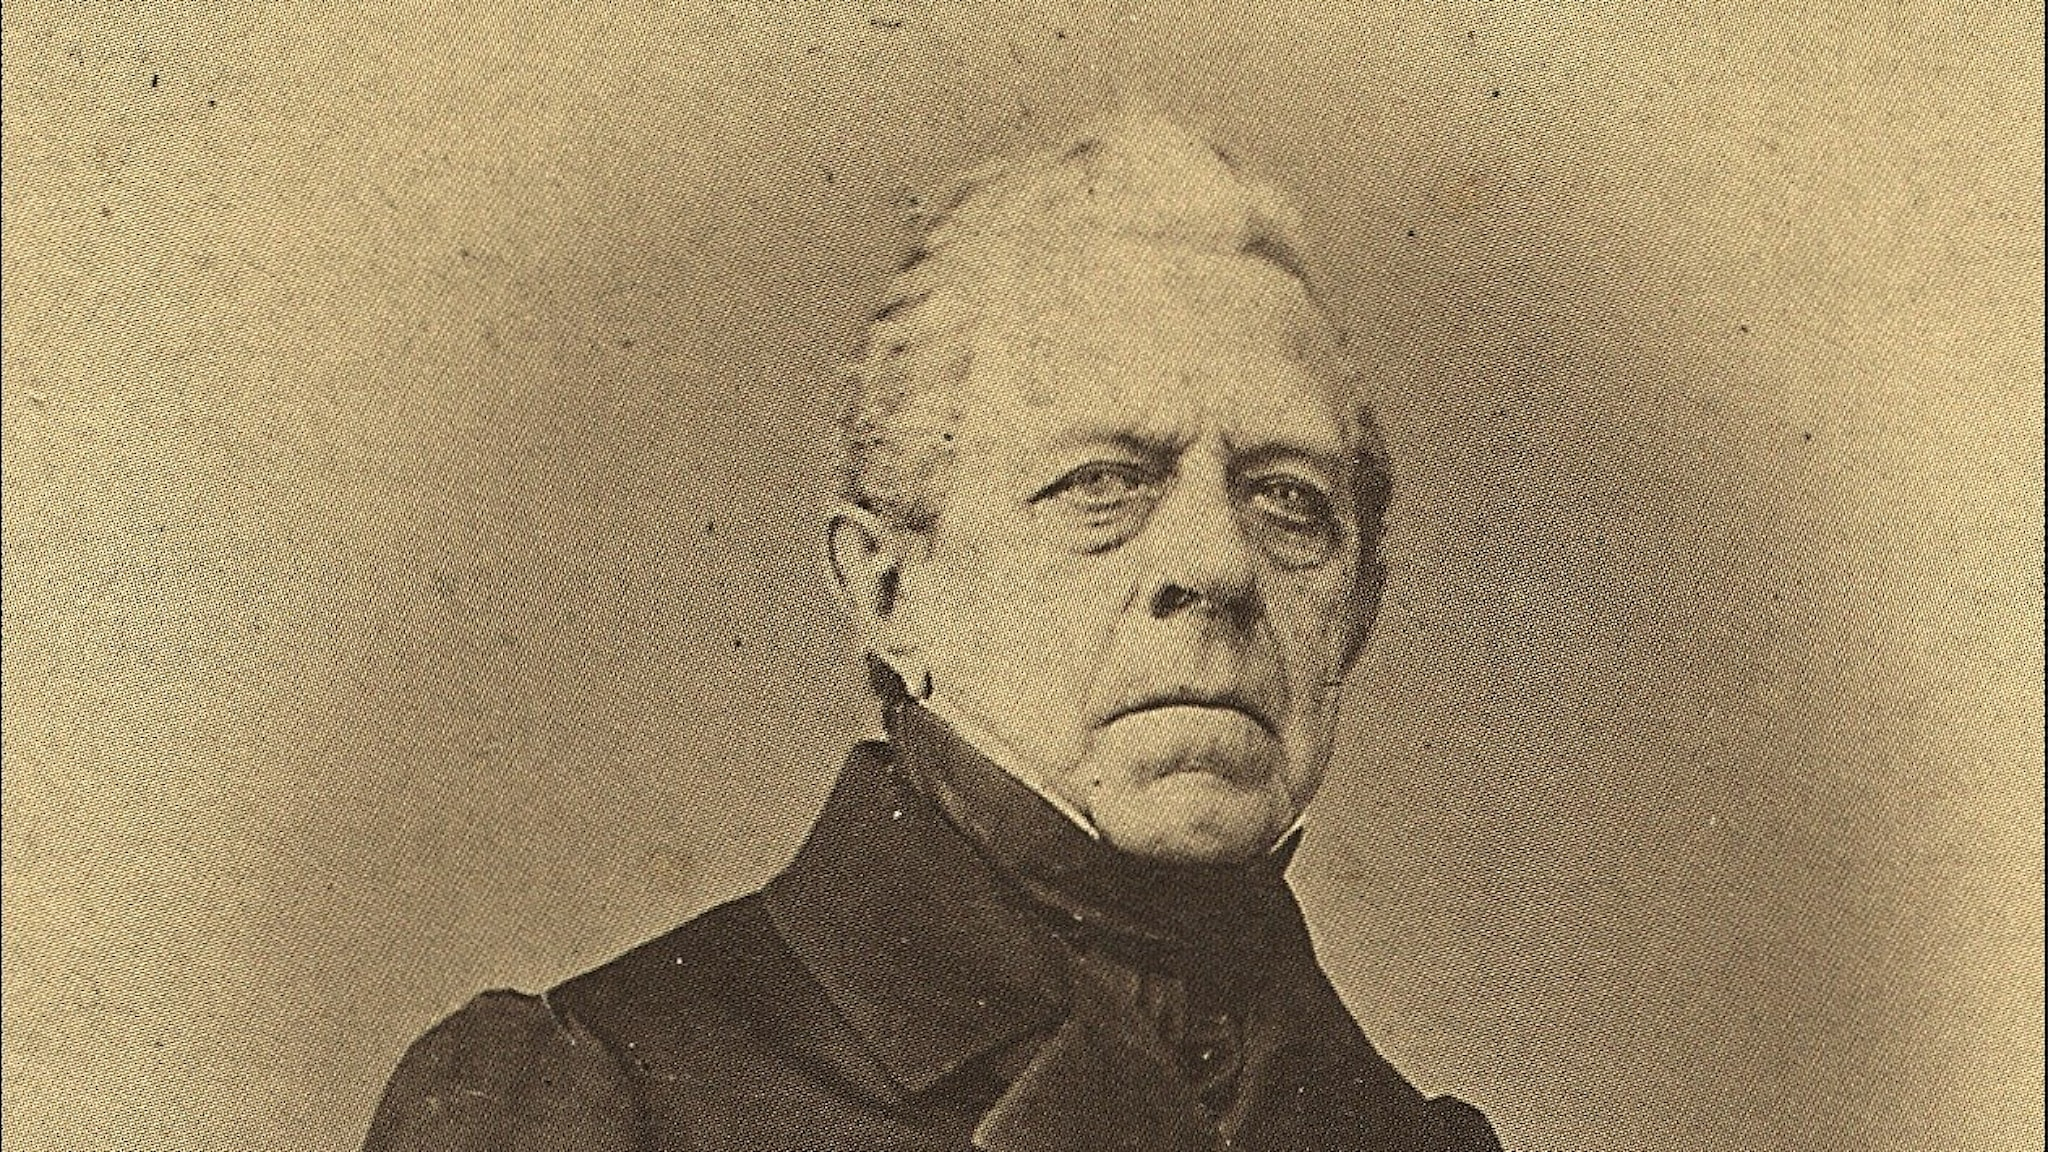 Franz Berwald, ca 1860, fotograf okänd.